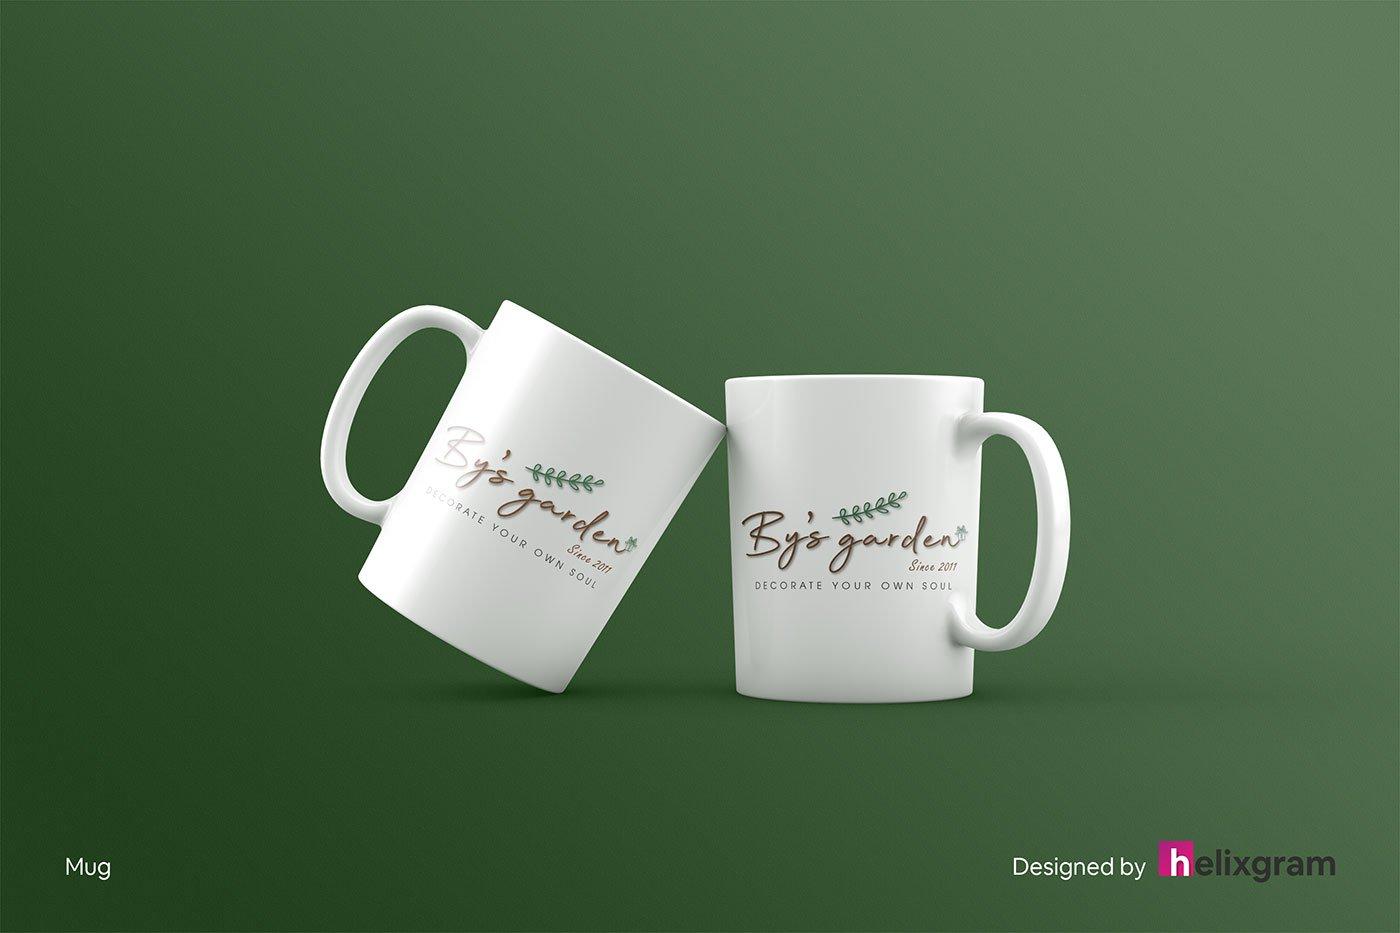 Brand-Identity-Design-mug-cup-By's-Garden-visual-identity-design-package-corporate-identity-design-logo-design-flyer-poster-book-cover-design-web-design-digital-advertising-design-Helixgram